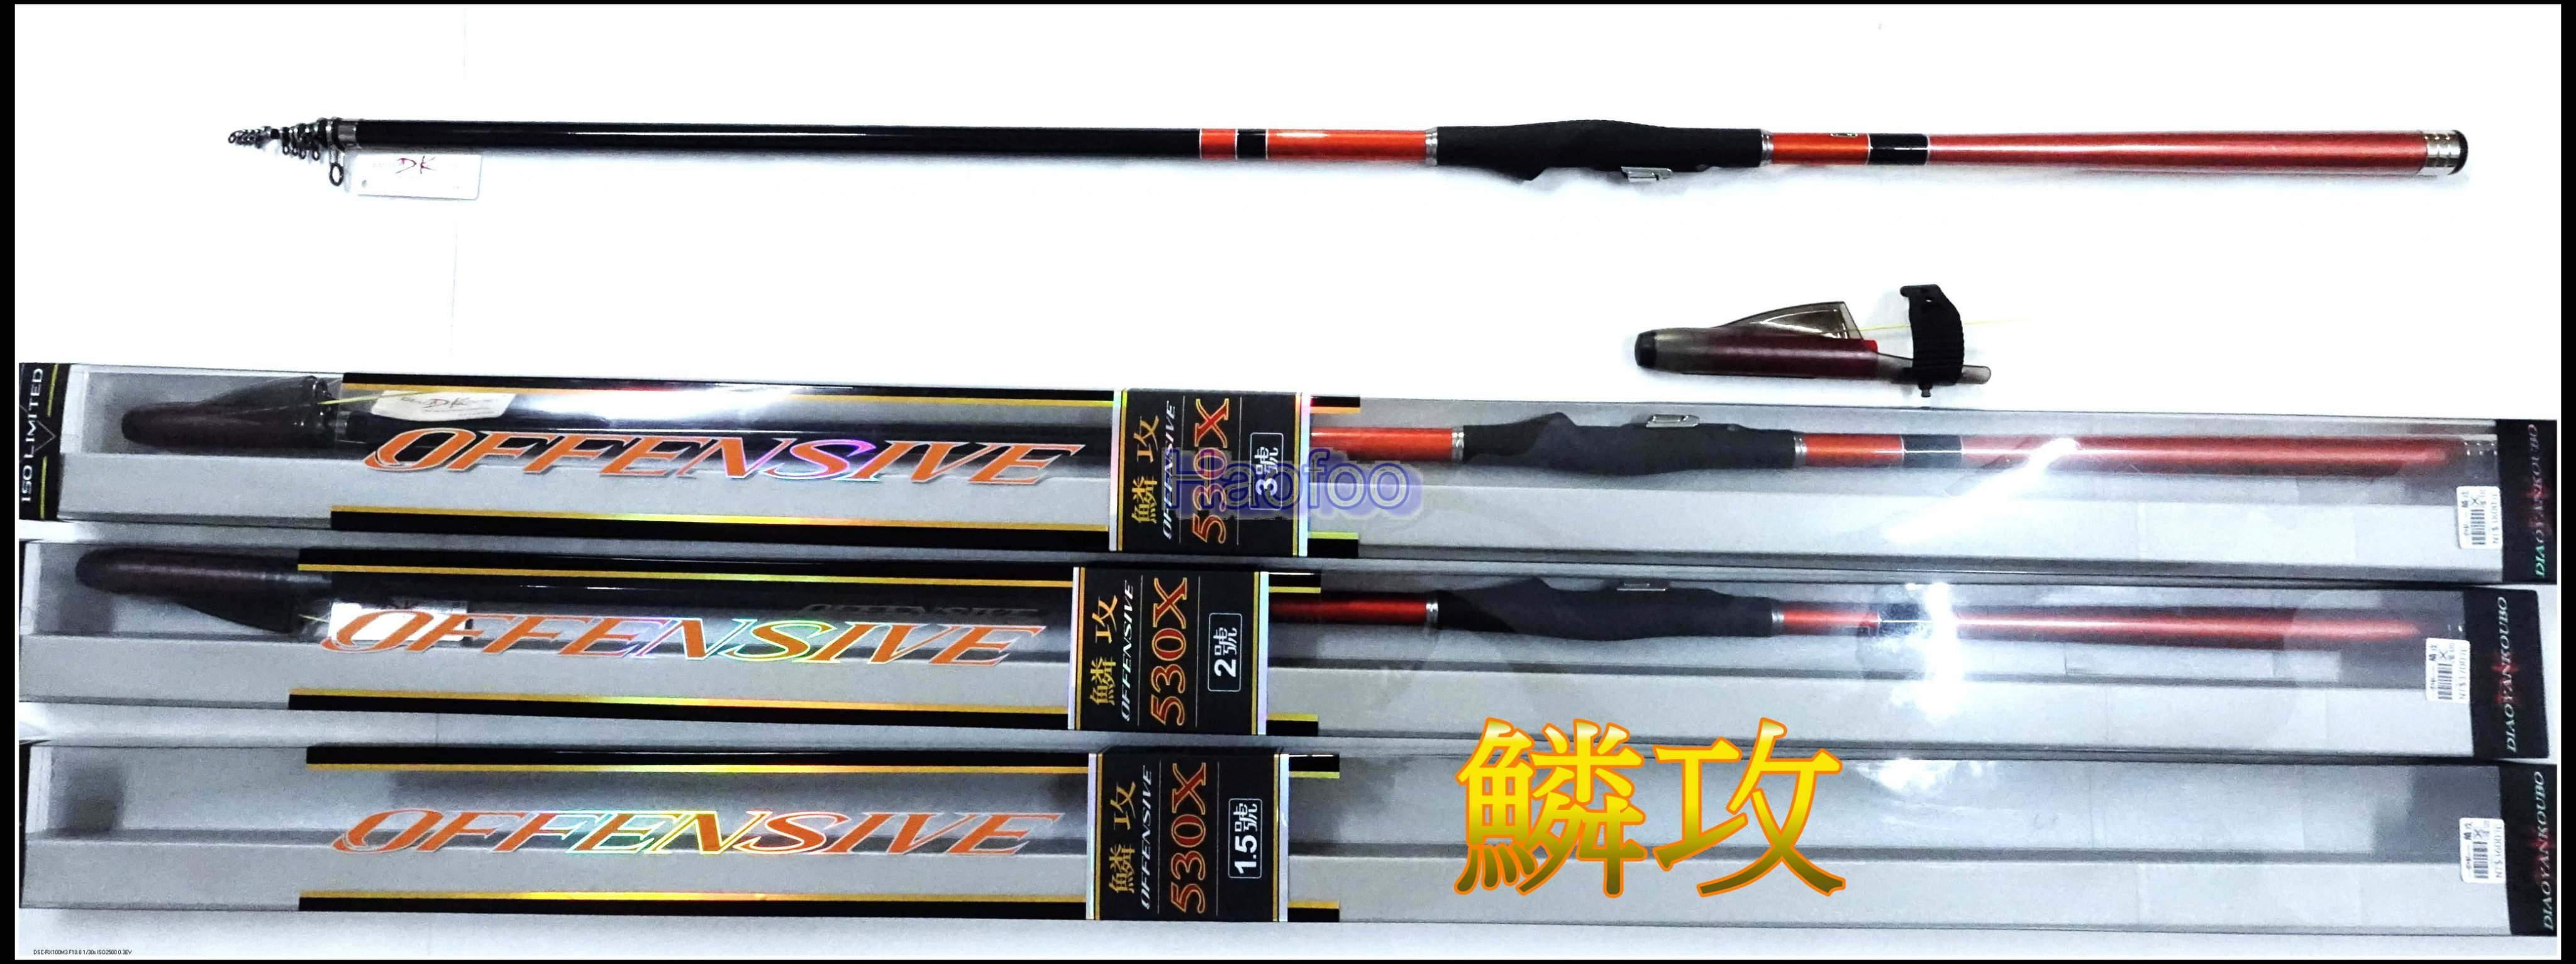 DK OFFENSIVE 鱗攻 500T 1號磯釣竿(尚有T530,X530系列賣場)-Haofoo 豪福釣具-